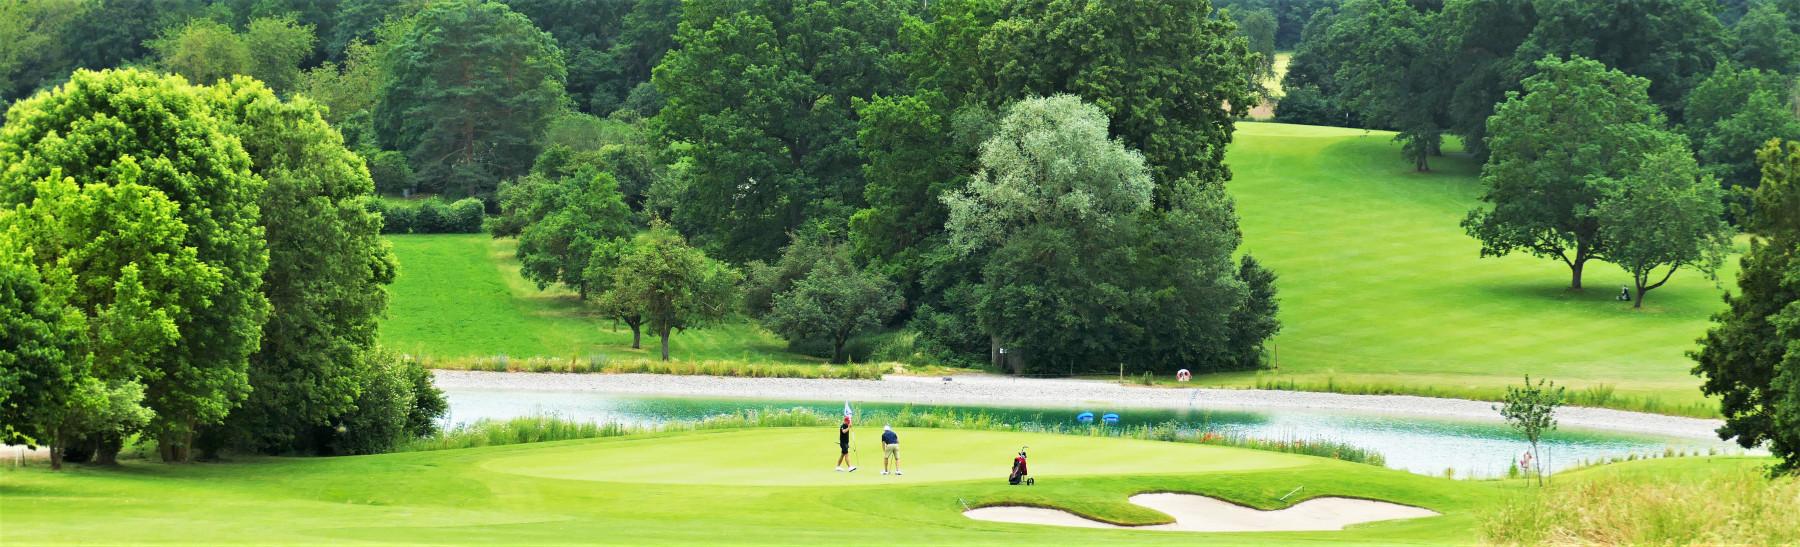 Stuttgarter Golf Club Solitude